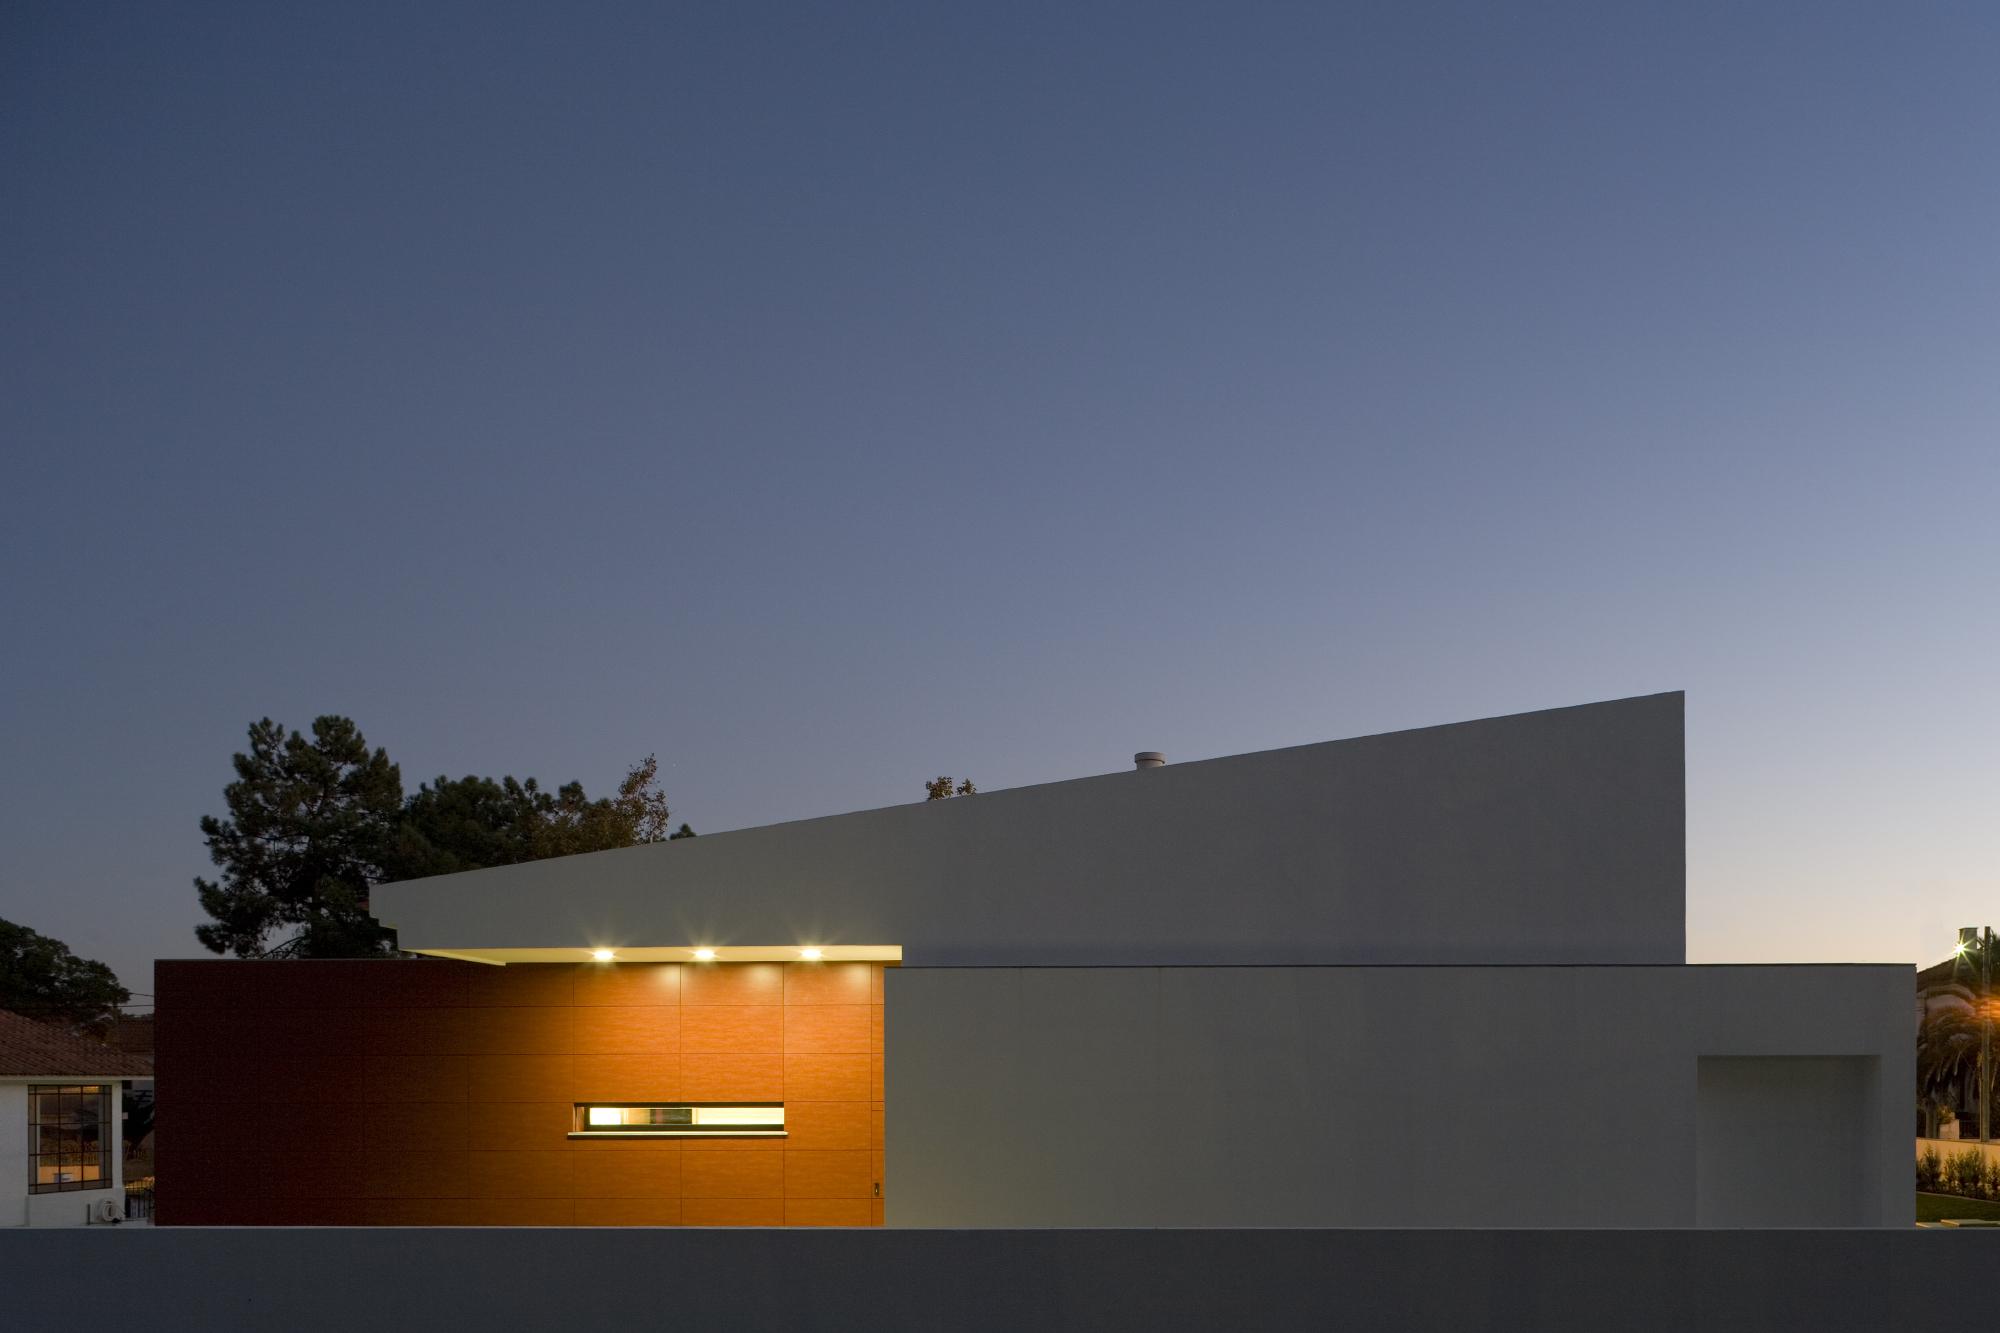 KARMATRENDZ | where design drives you crazy | Page 446